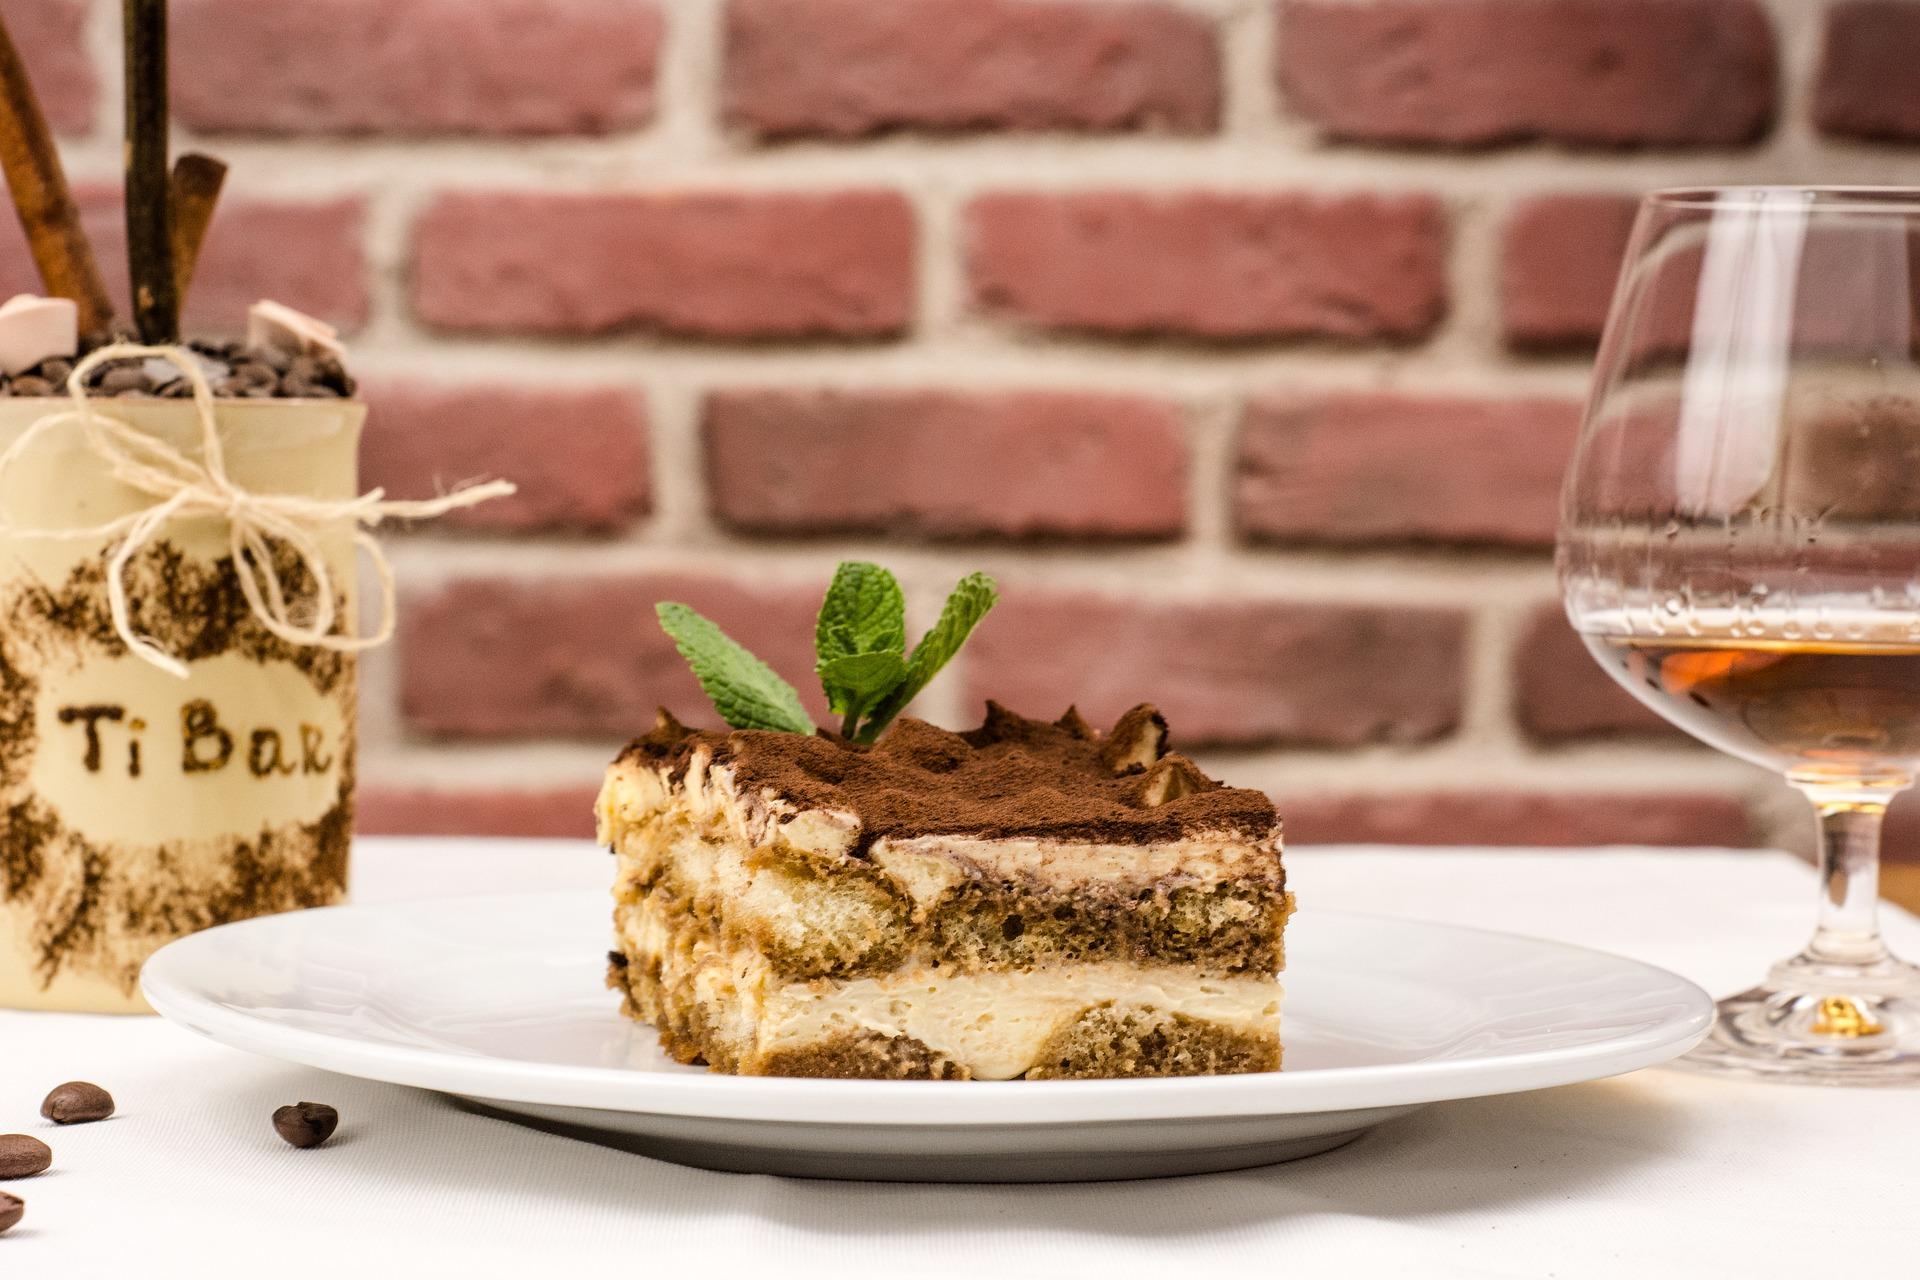 Tiramisú clásico en la comida italiana